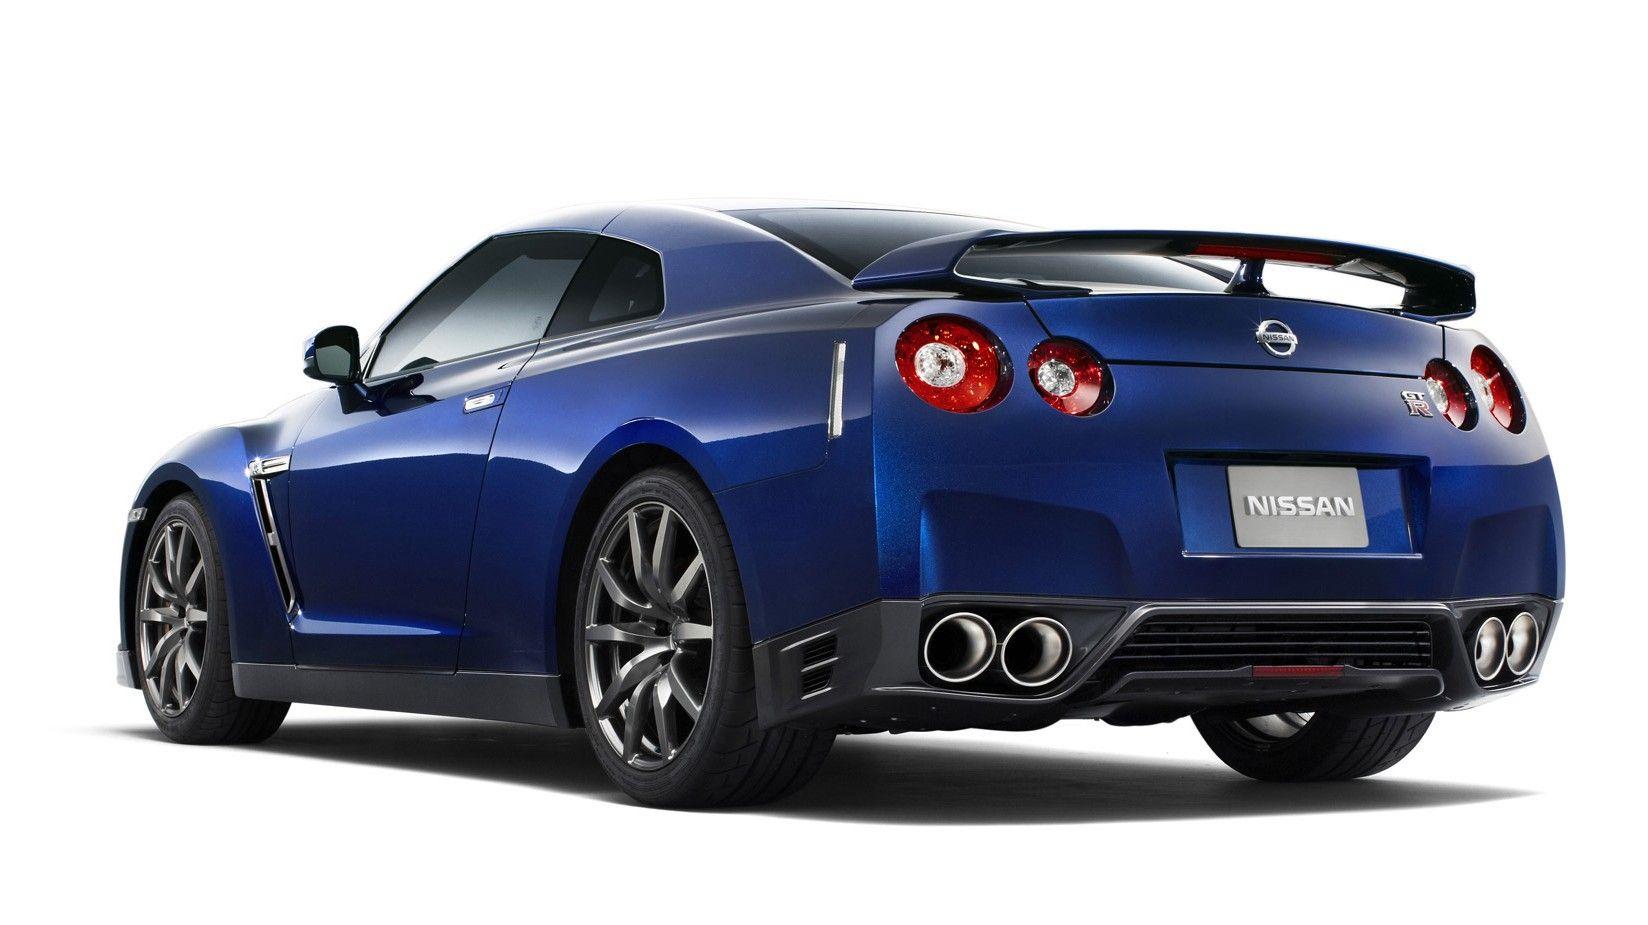 Pictures Of Nissan Skyline Gtr Full Cars Hd Gt R Motor